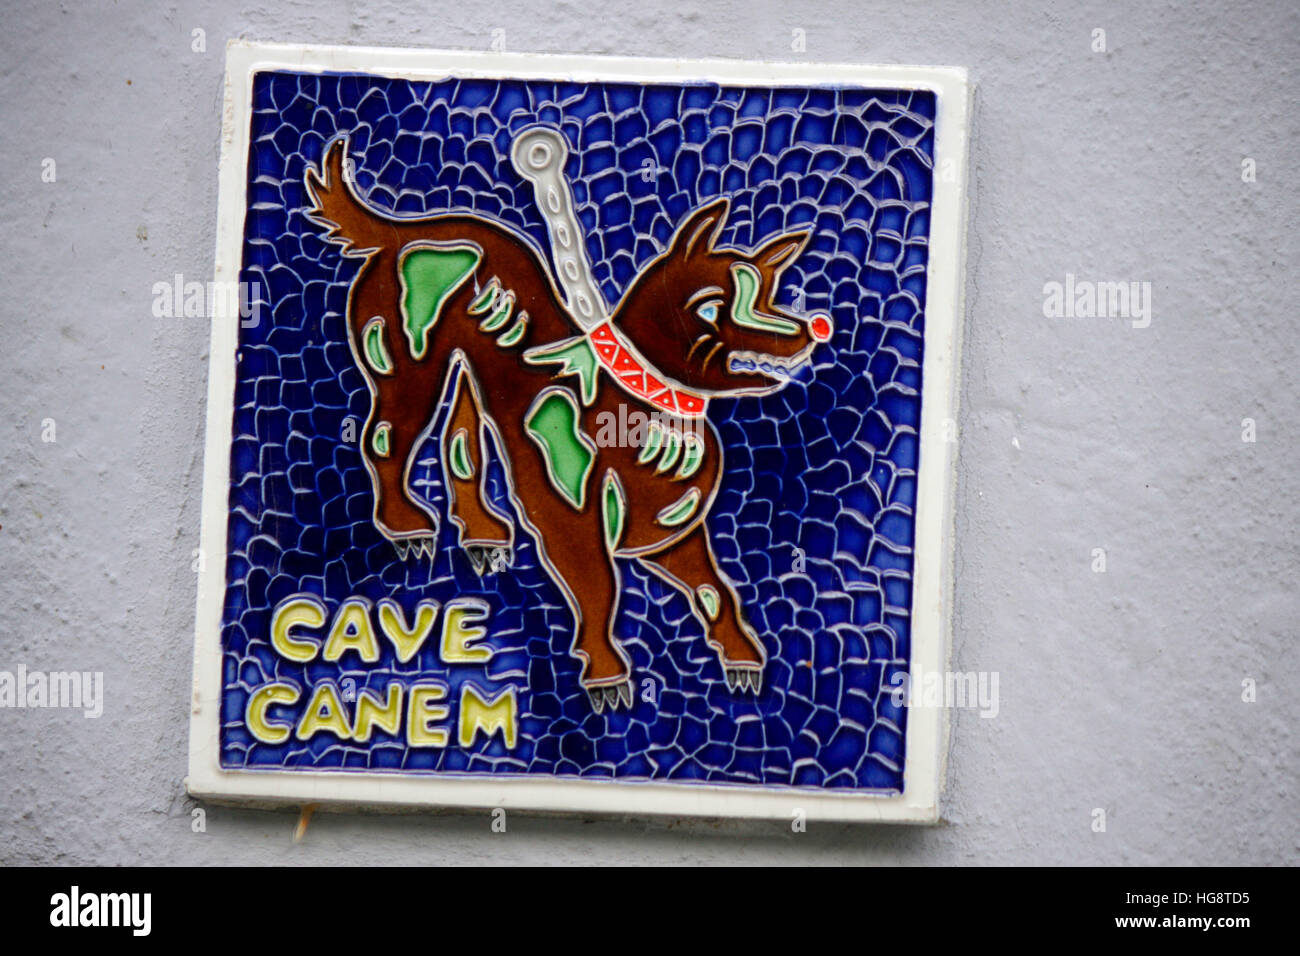 """Höhle Carnem' - großgeschrieben Vor Dem Hund, Schweiz. Stockbild"